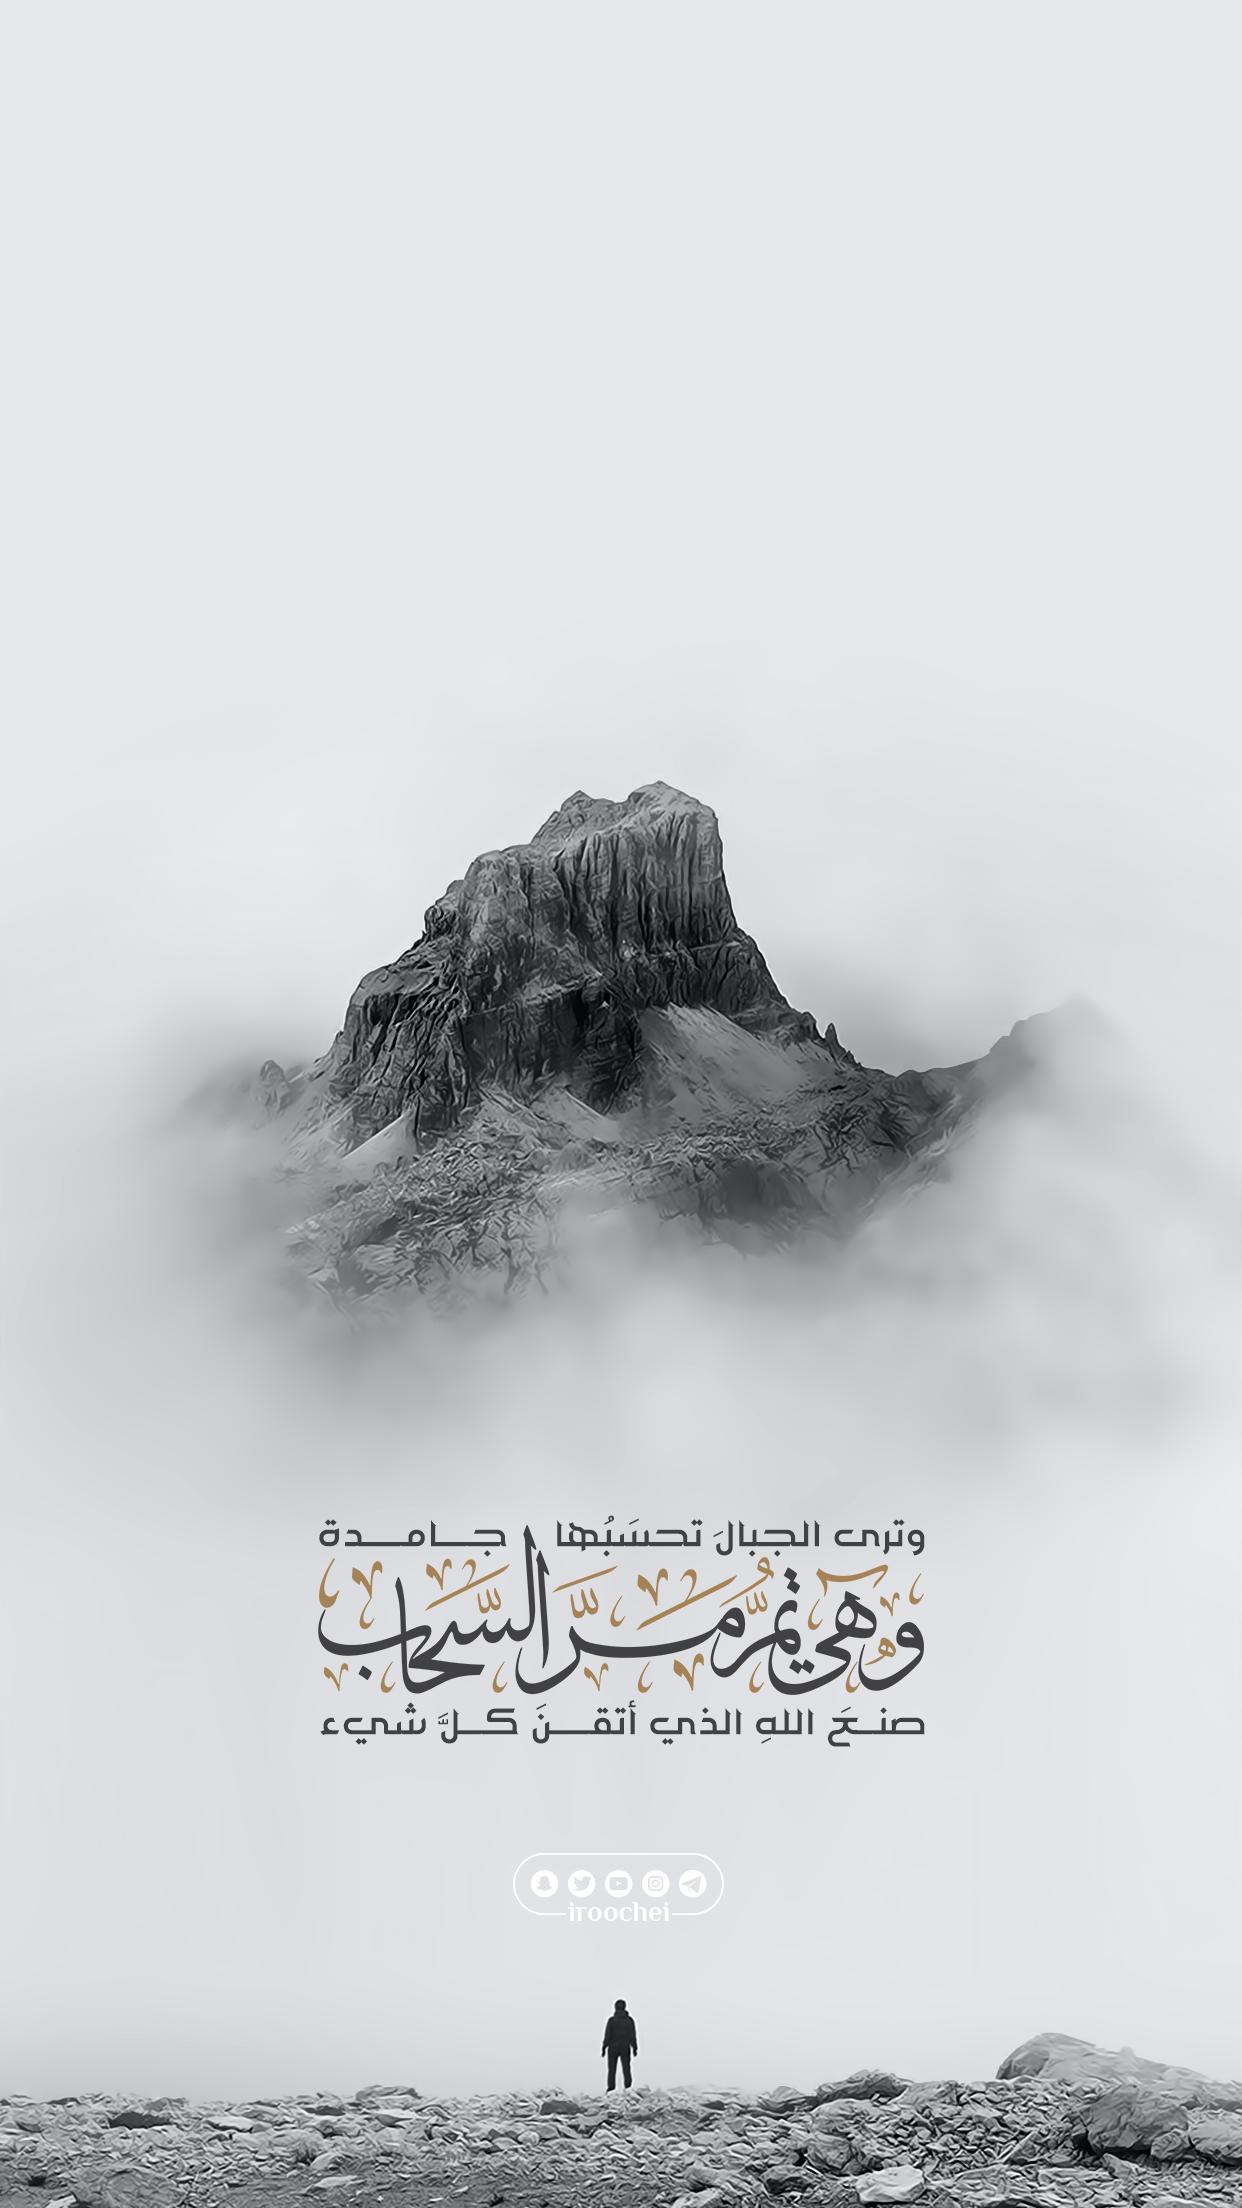 صنع الله الذي أتقن كل شيء Quran Quotes Verses Quran Quotes Inspirational Beautiful Quran Quotes